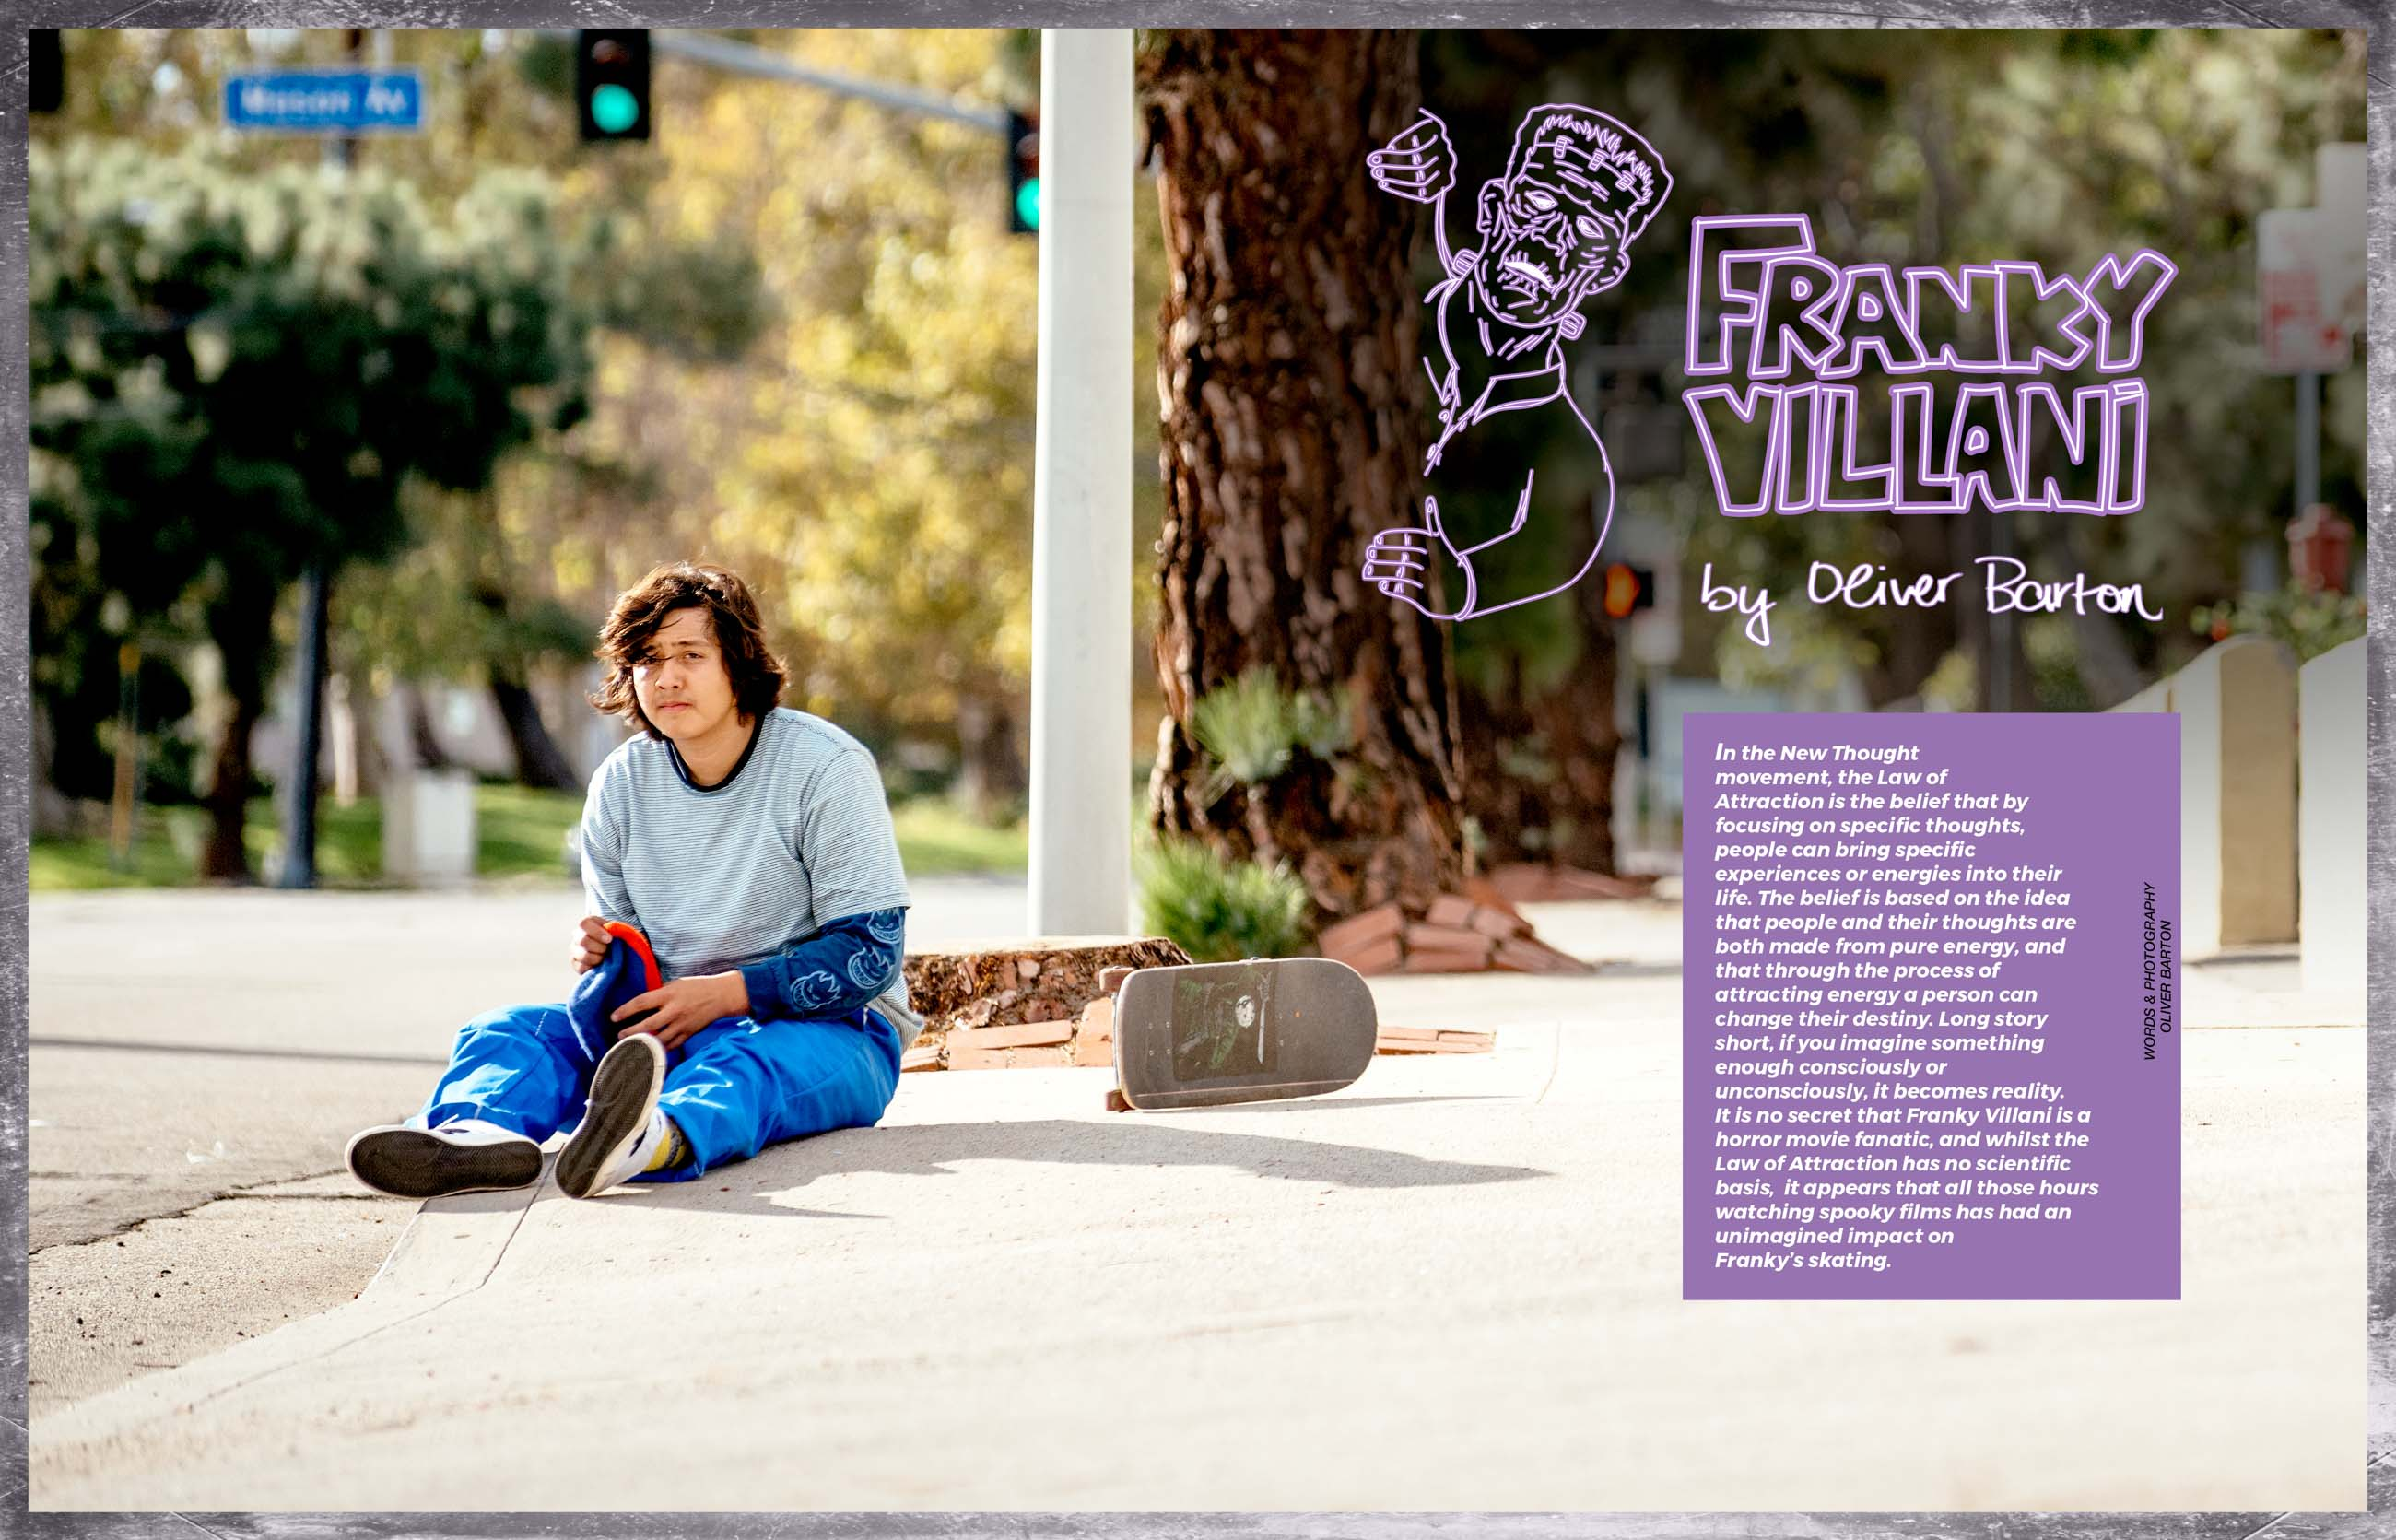 FRANKY VILLANI BY OLIVER BARTON – Pocket Skateboard Magazine